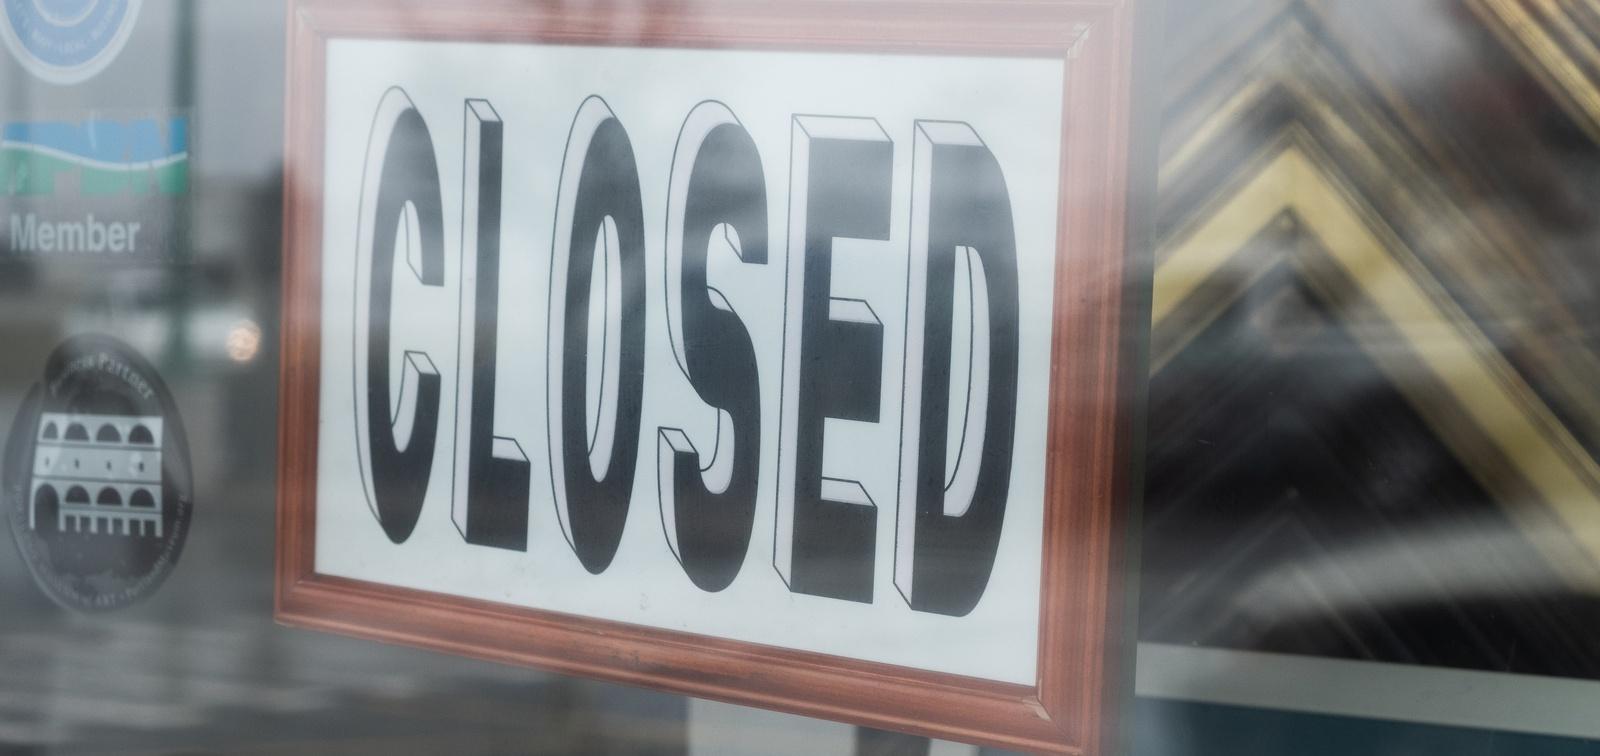 53% of restaurants closed amid coronavirus have shuttered permanently, Yelp data shows